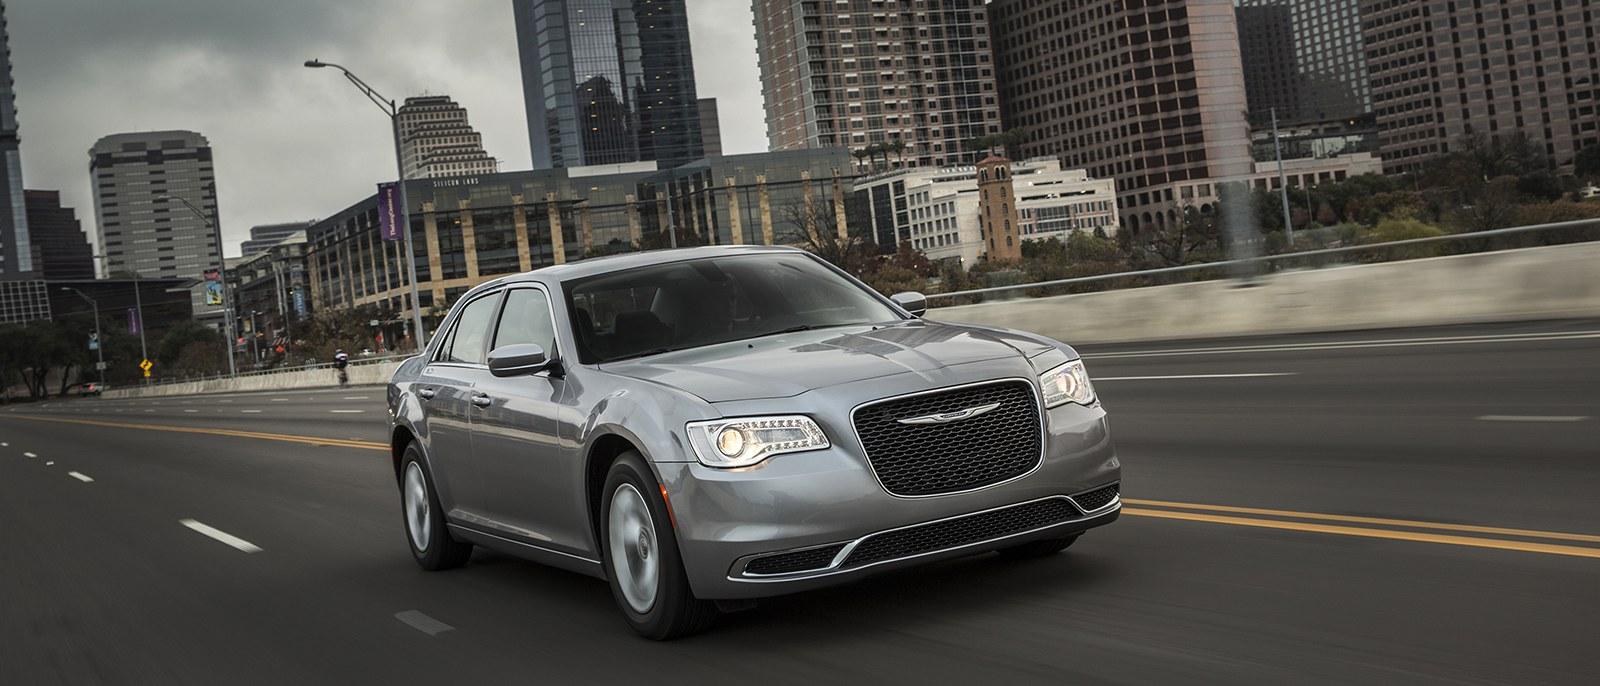 Silver 2016 Chrysler 300 Driving